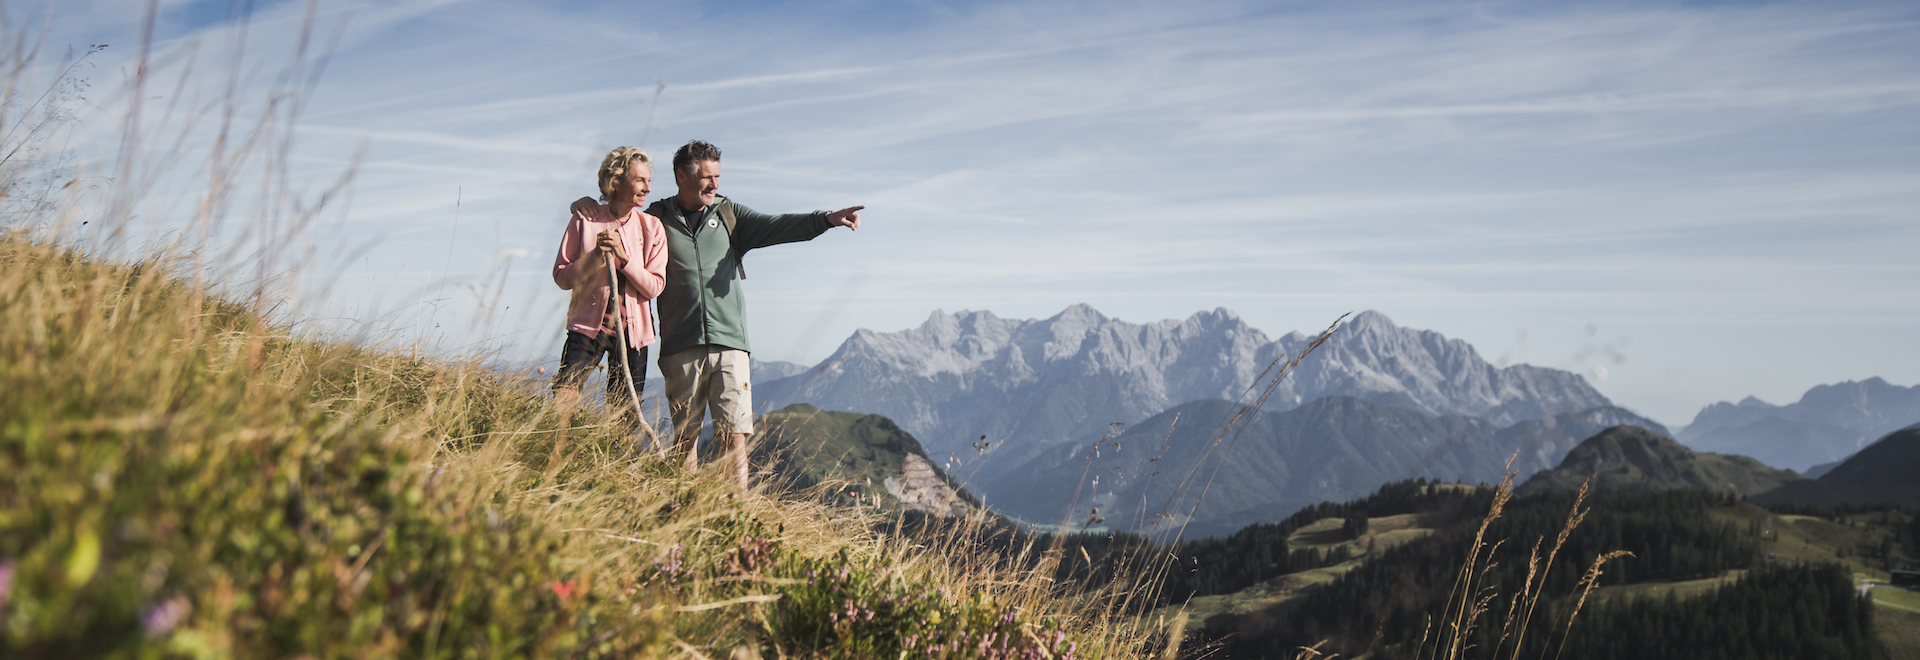 Wandern/Hiking in Saalbach Hinterglem